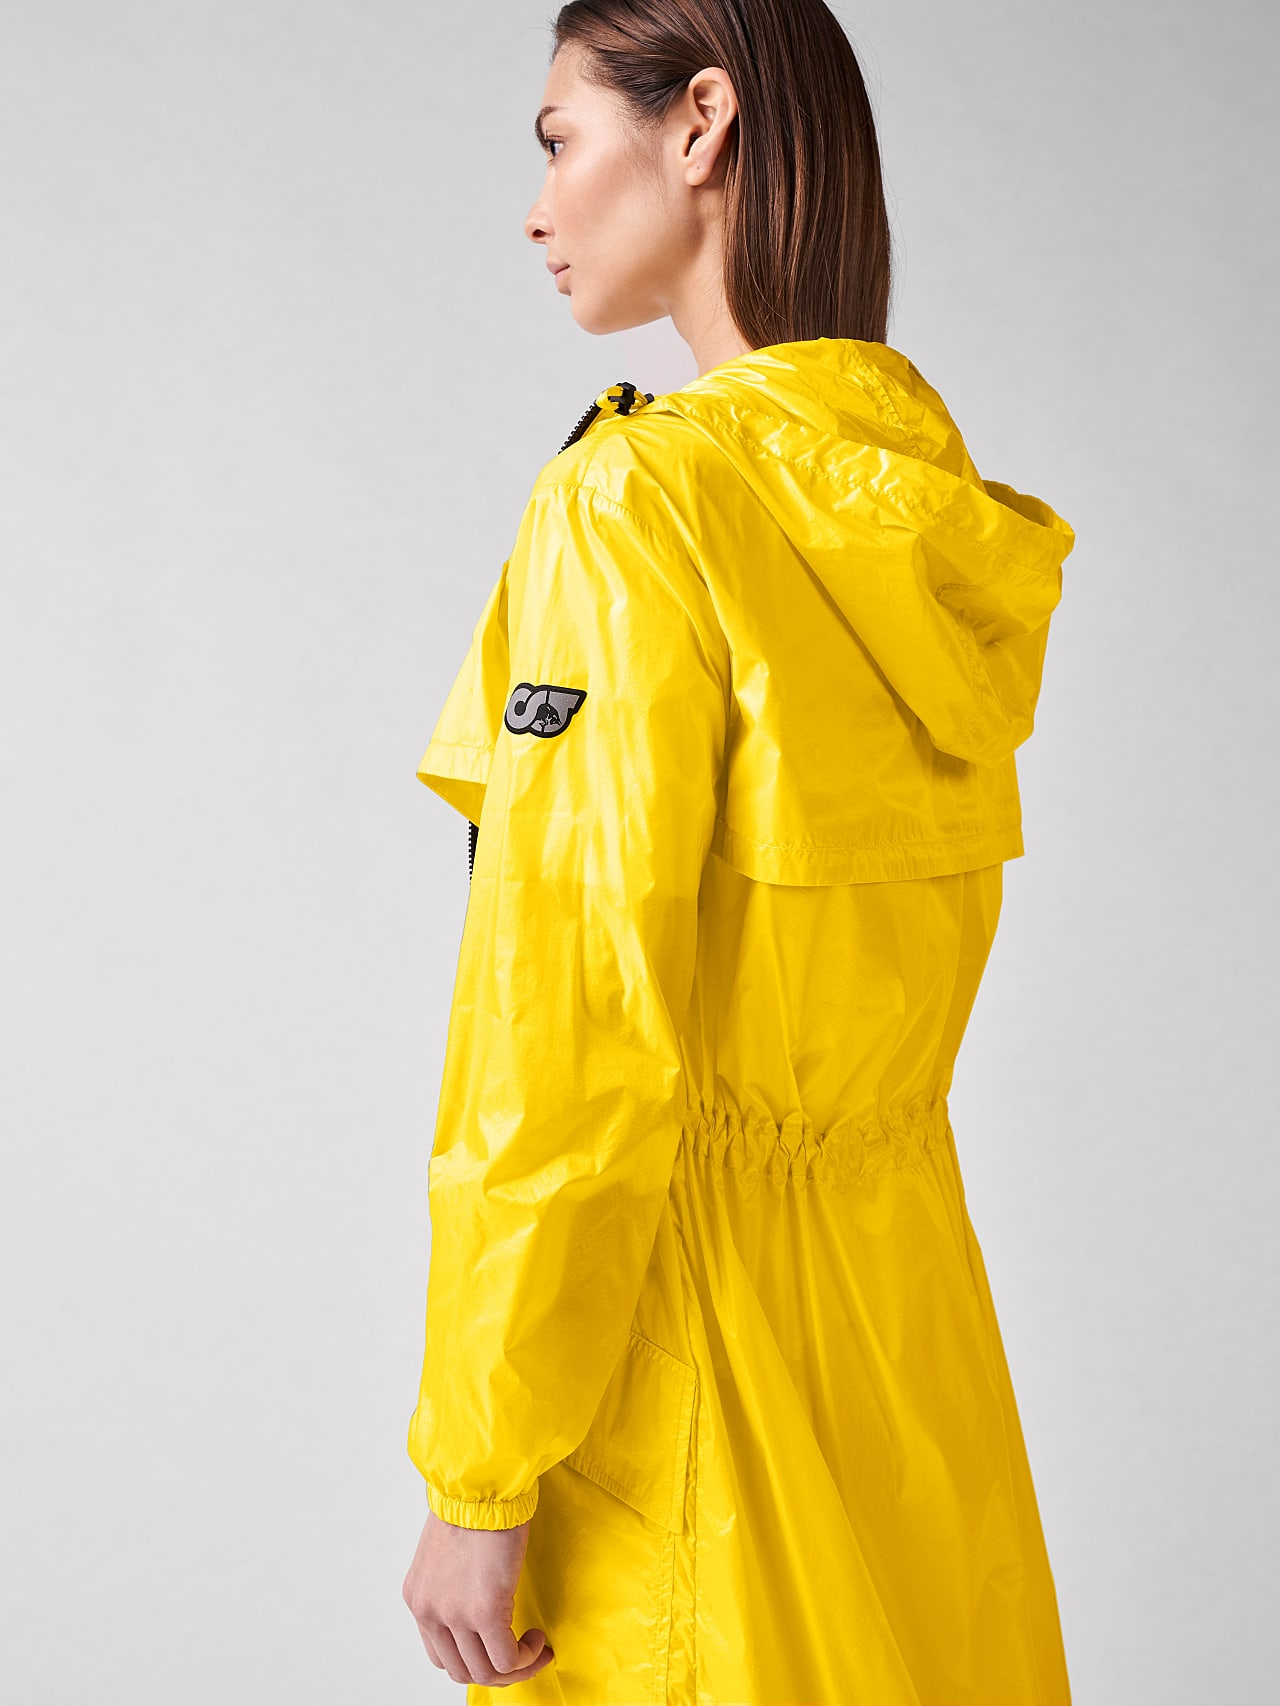 OLONO V2.Y5.01 Packable Windbreaker Coat yellow Right Alpha Tauri